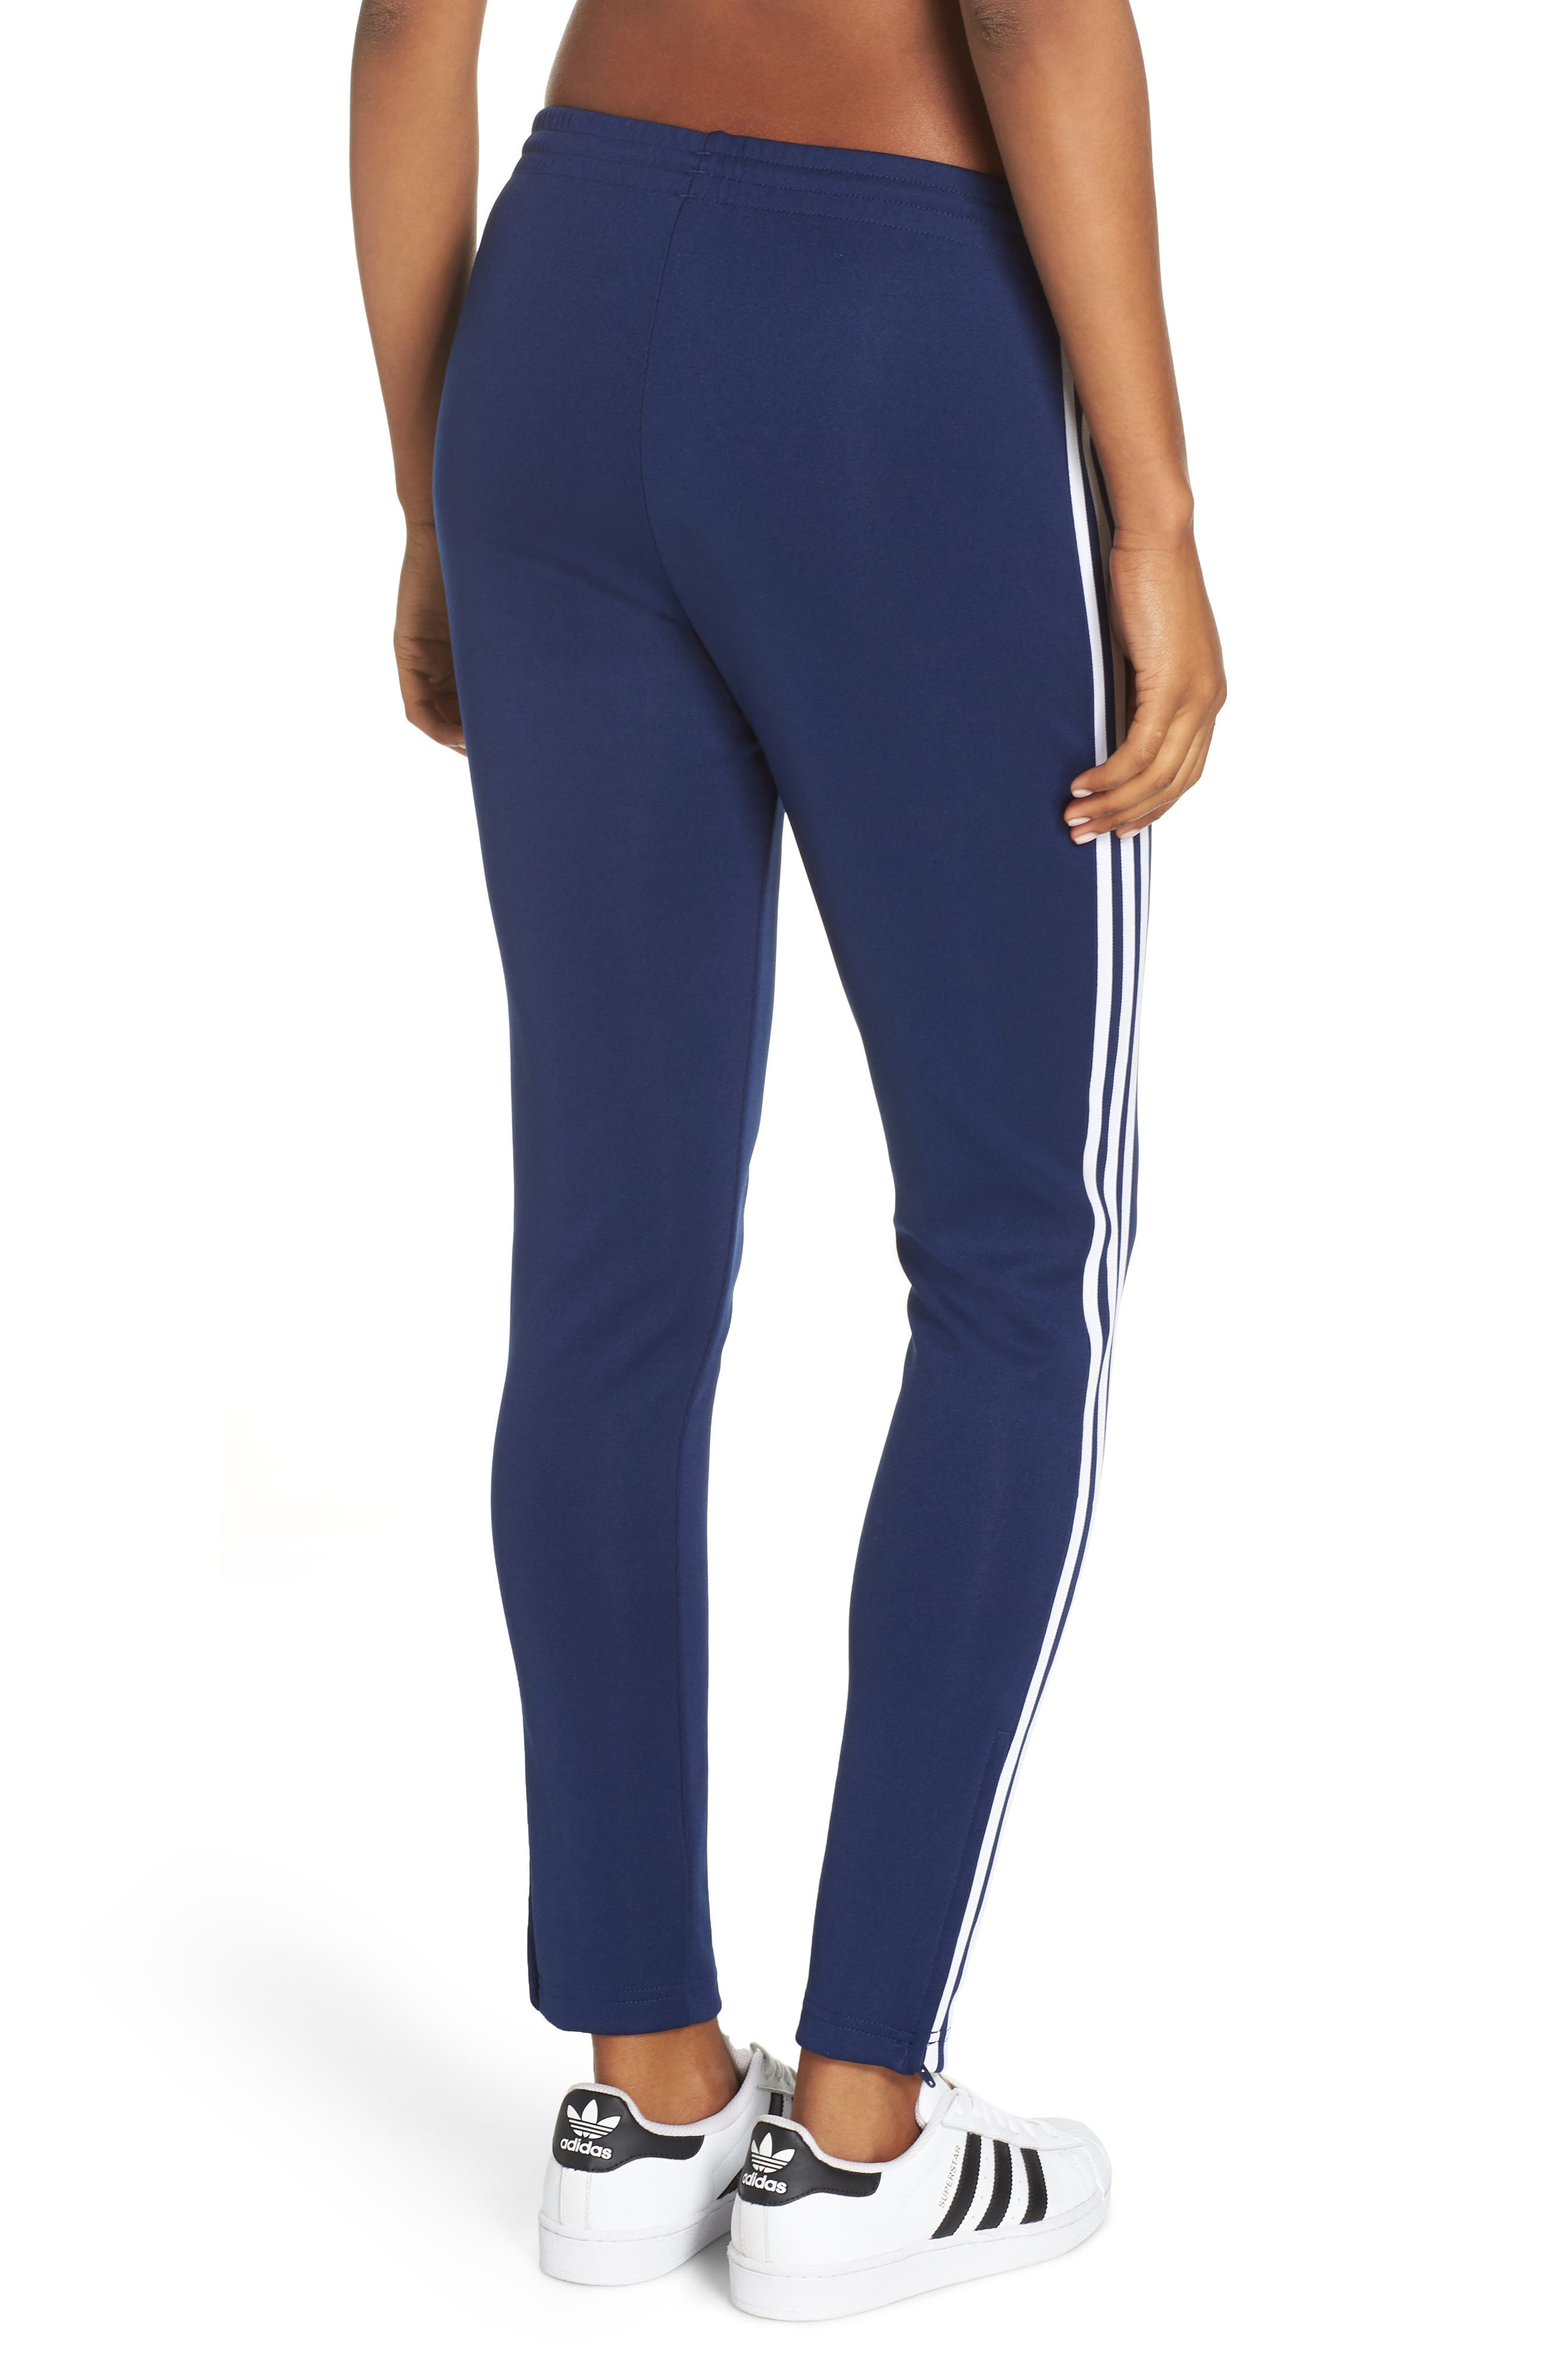 SST Track Pants,                             Alternate thumbnail 2, color,                             DARK BLUE